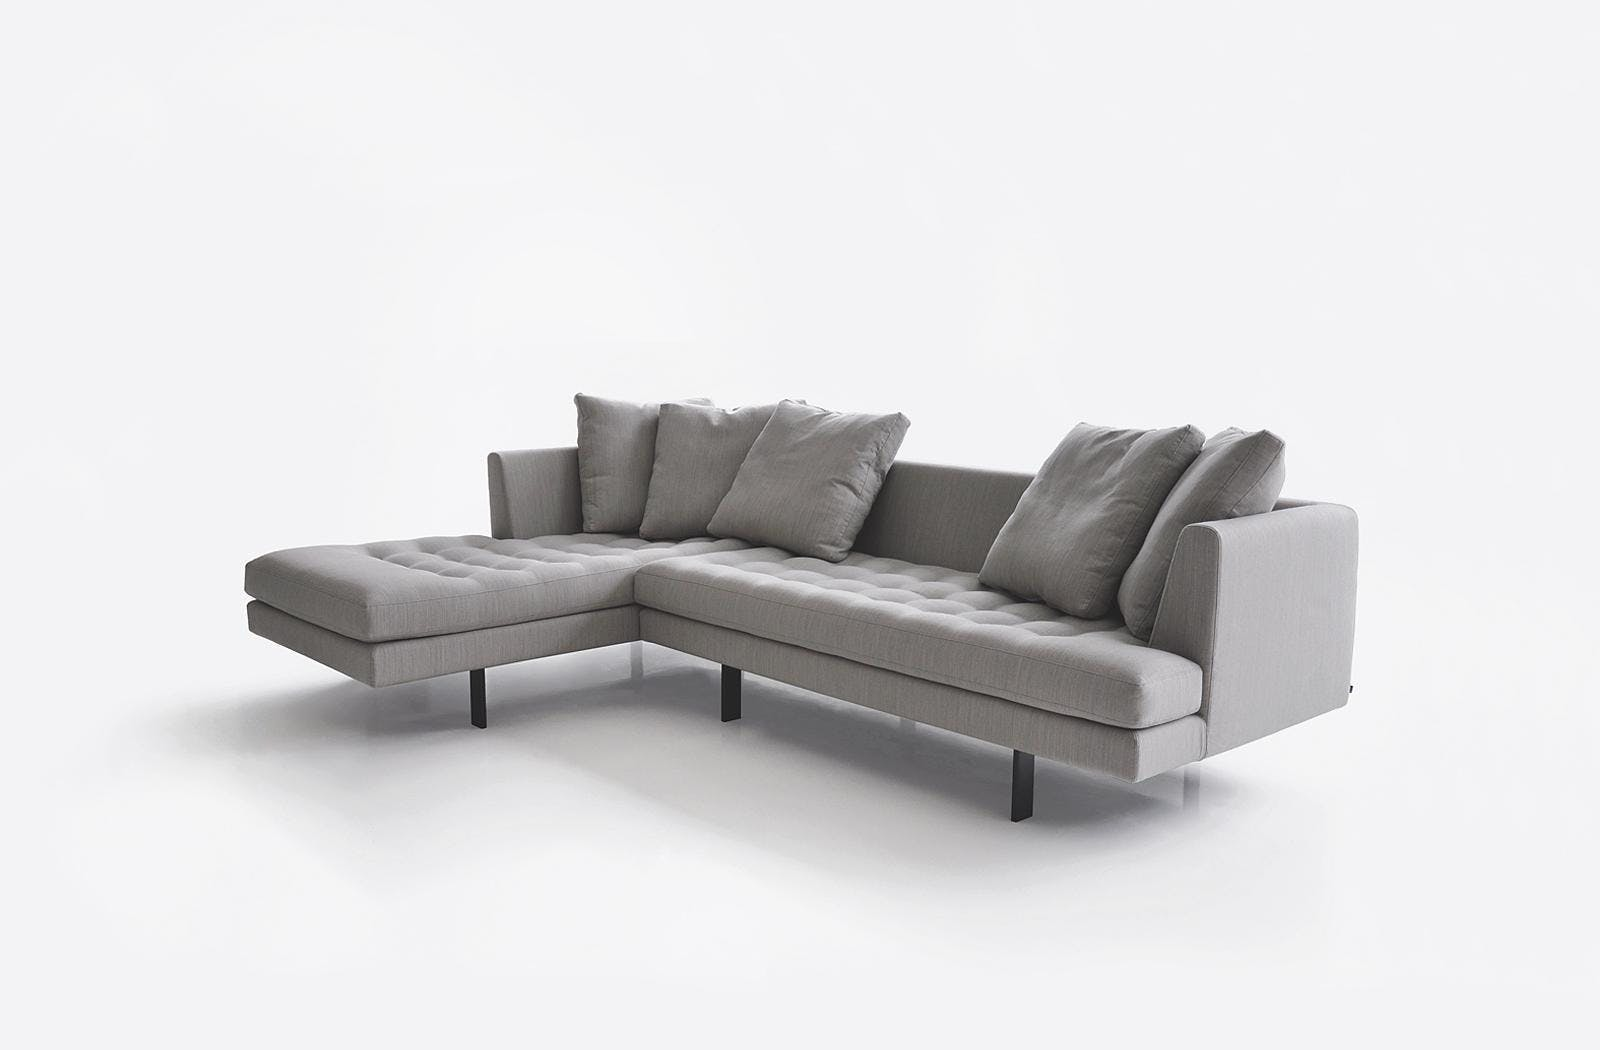 Bensen Grey Edward Sectional Sofa Angle